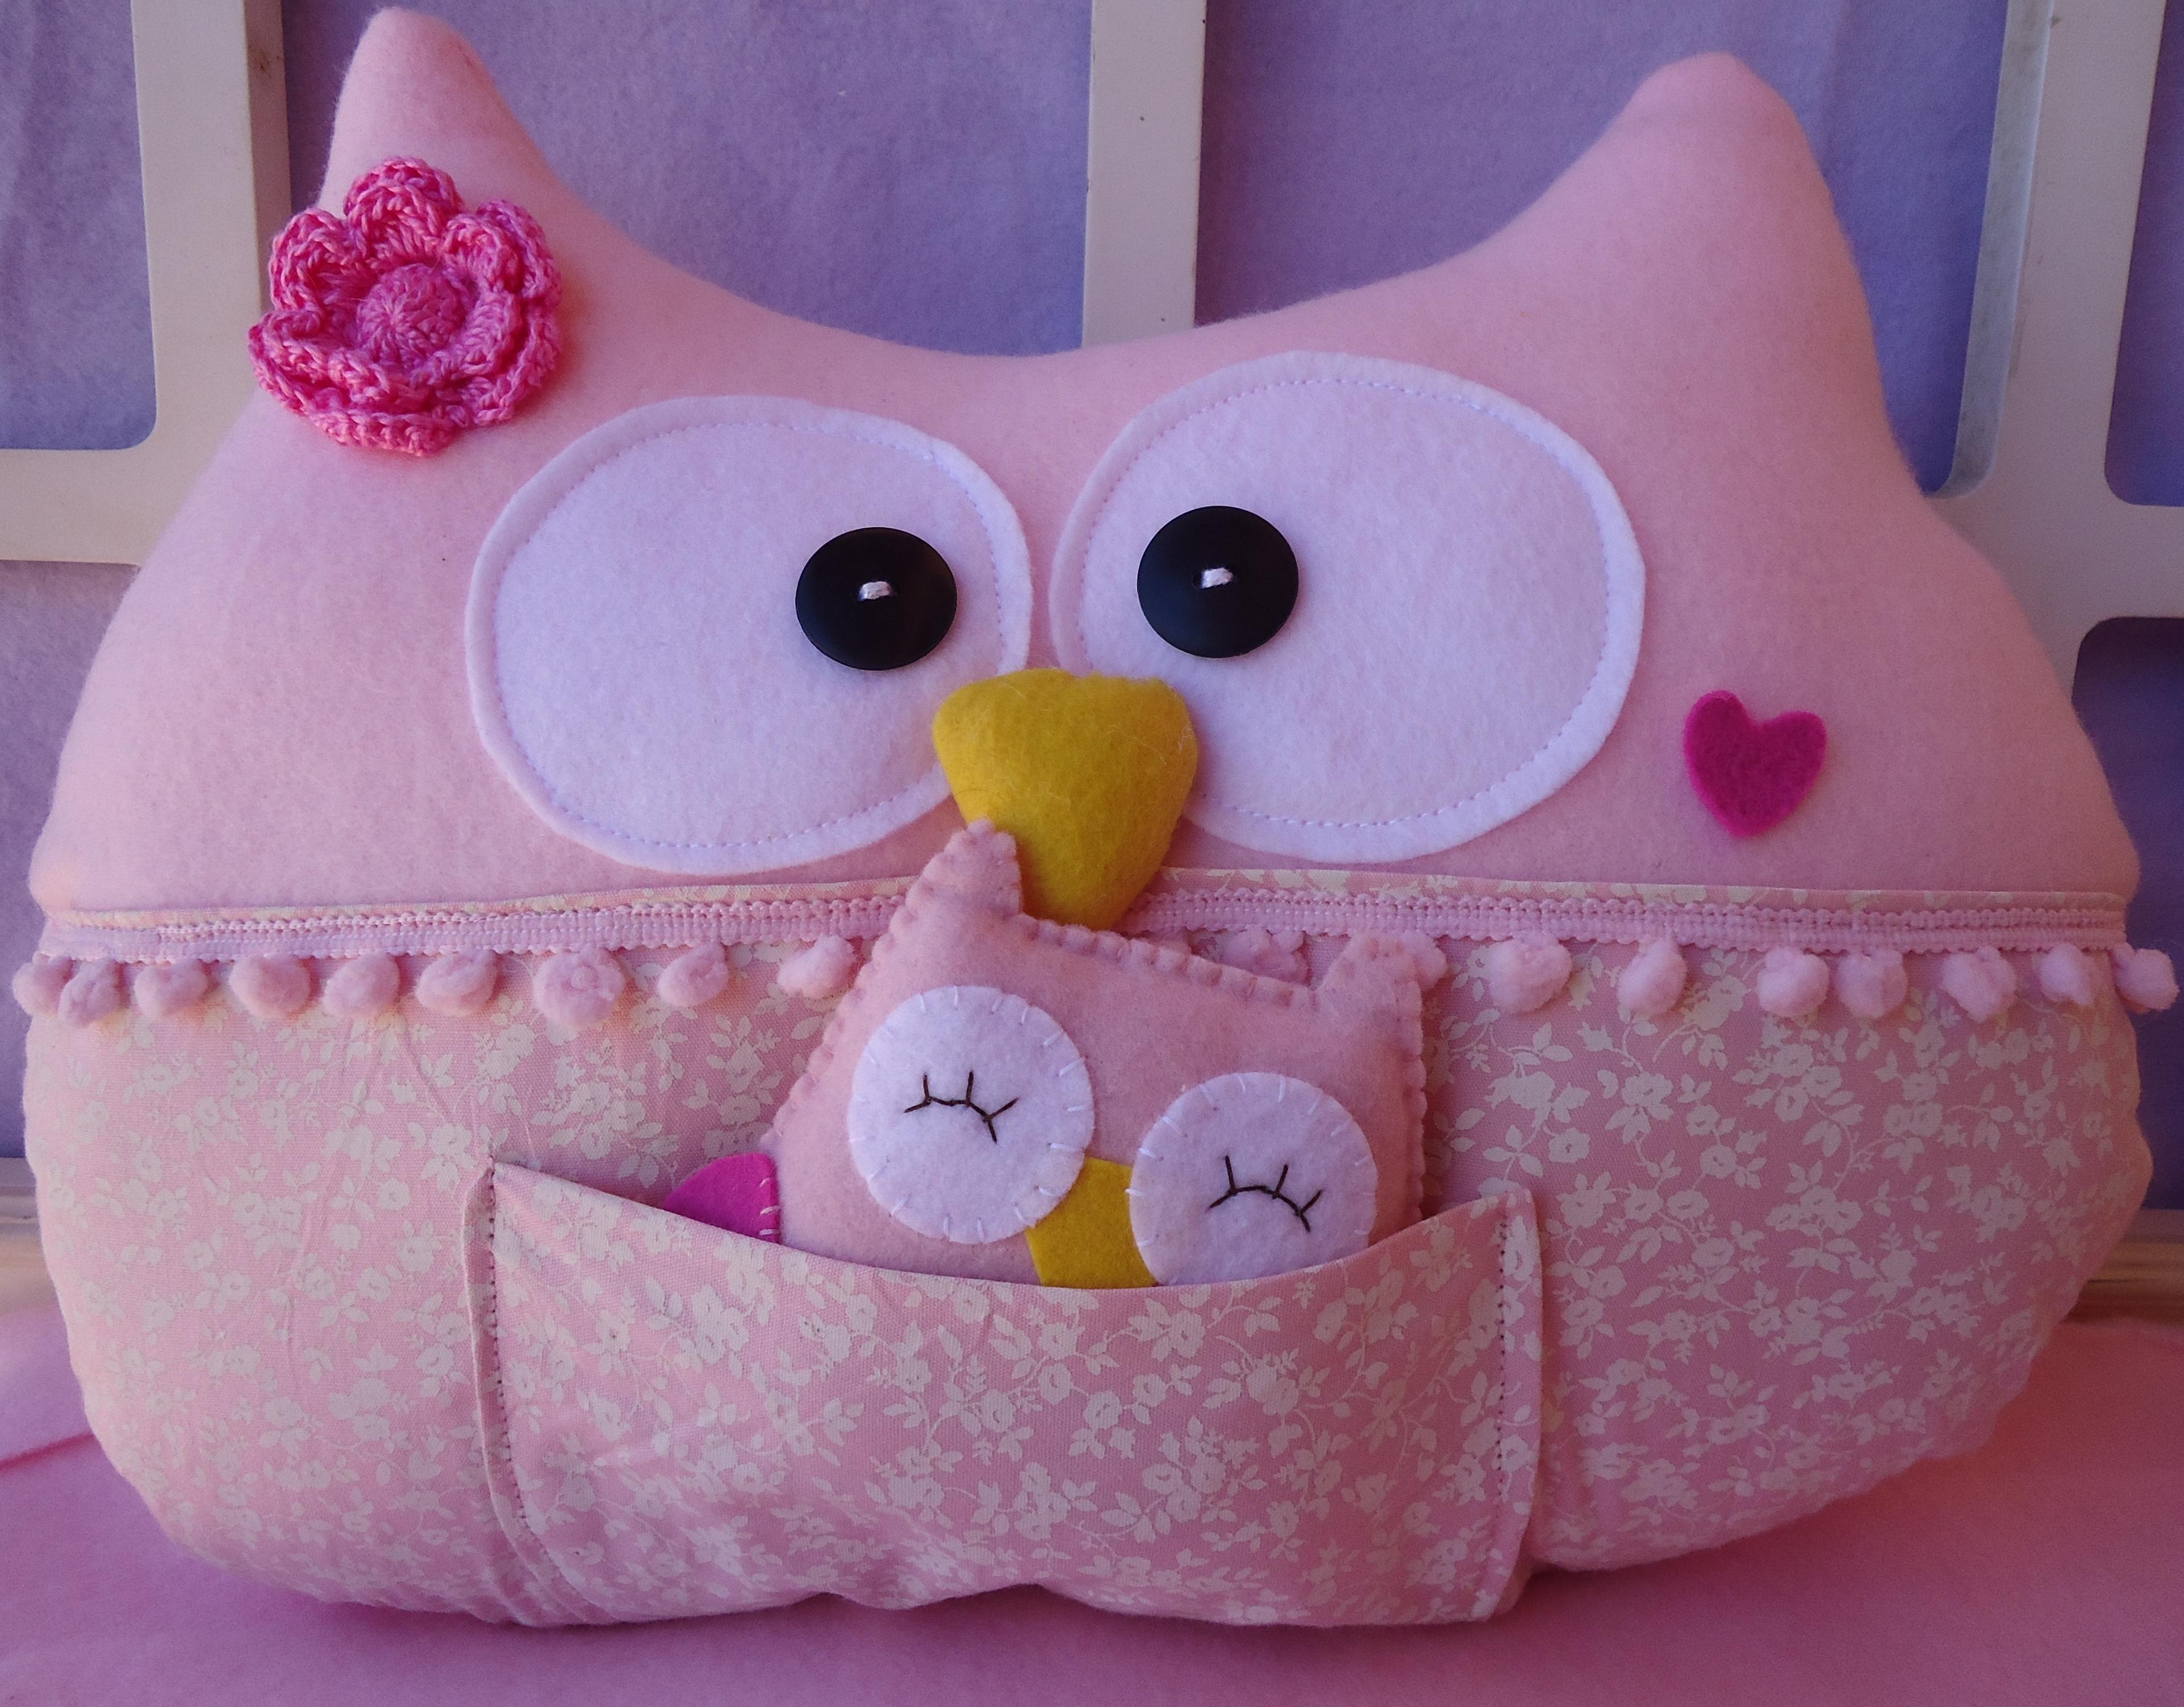 almofada mamae coruja almofada mamae coruja almofada mamae coruja ...